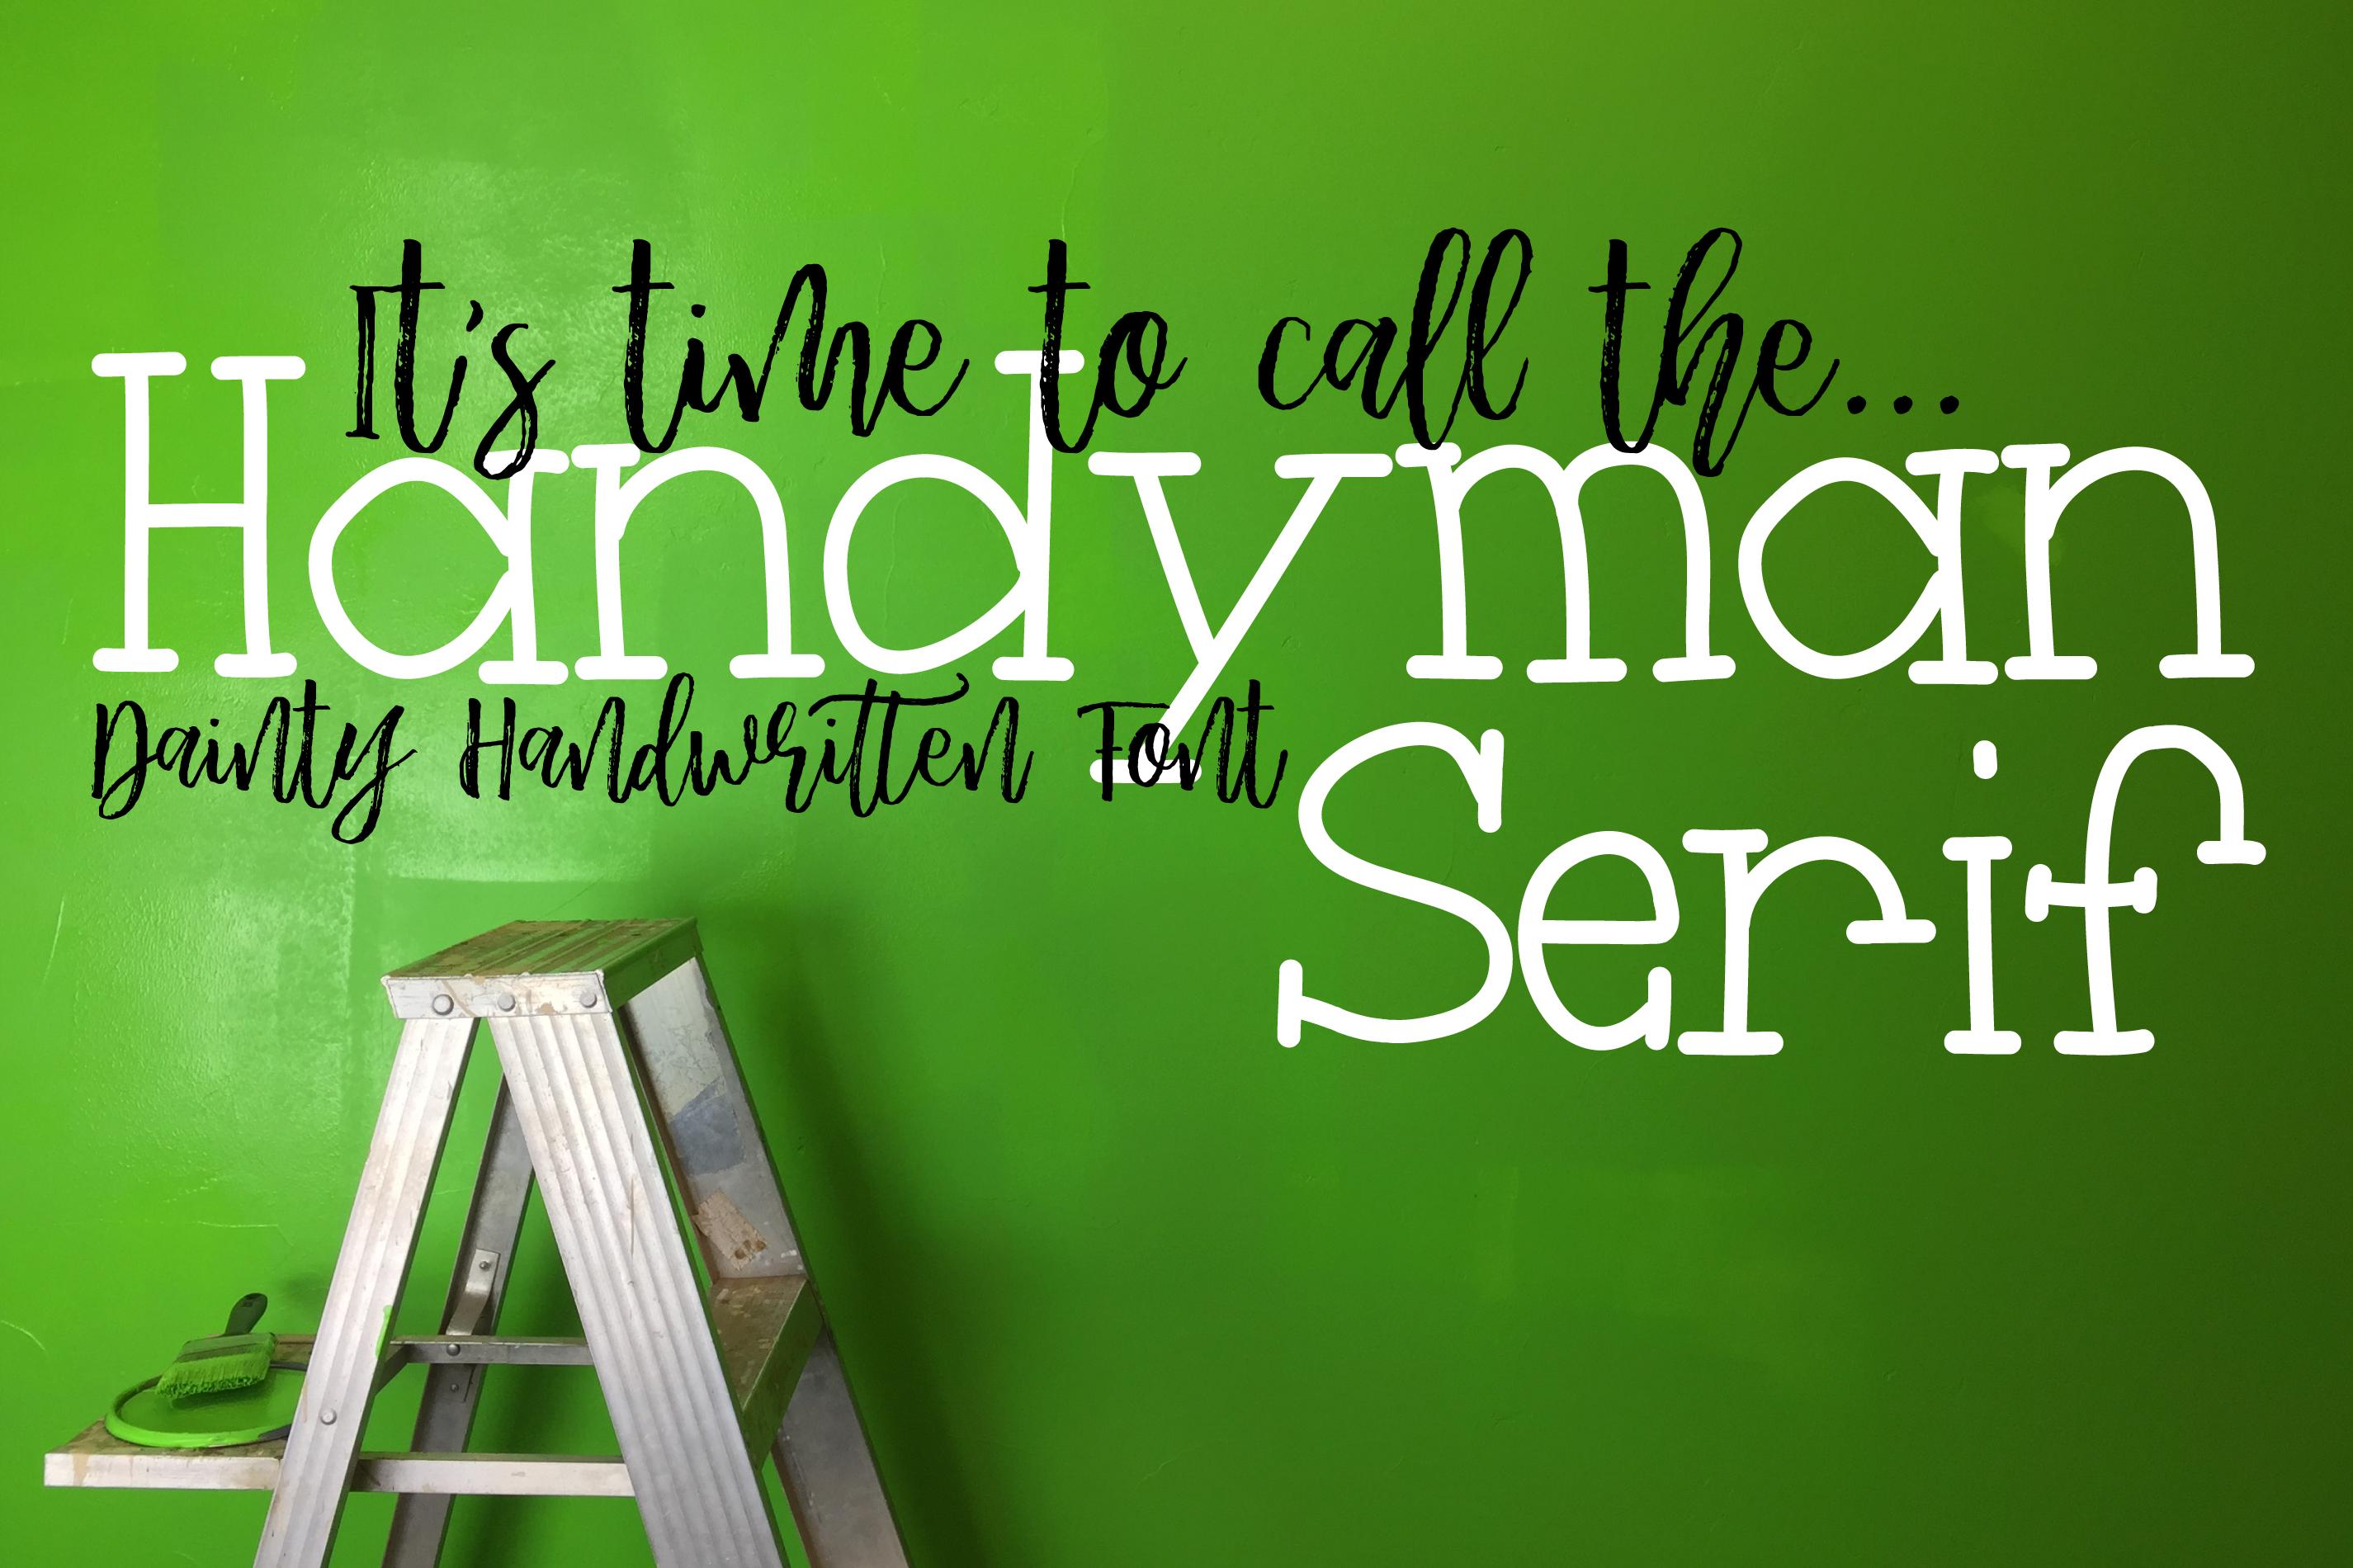 Handyman Serif Handdrawn Font example image 1